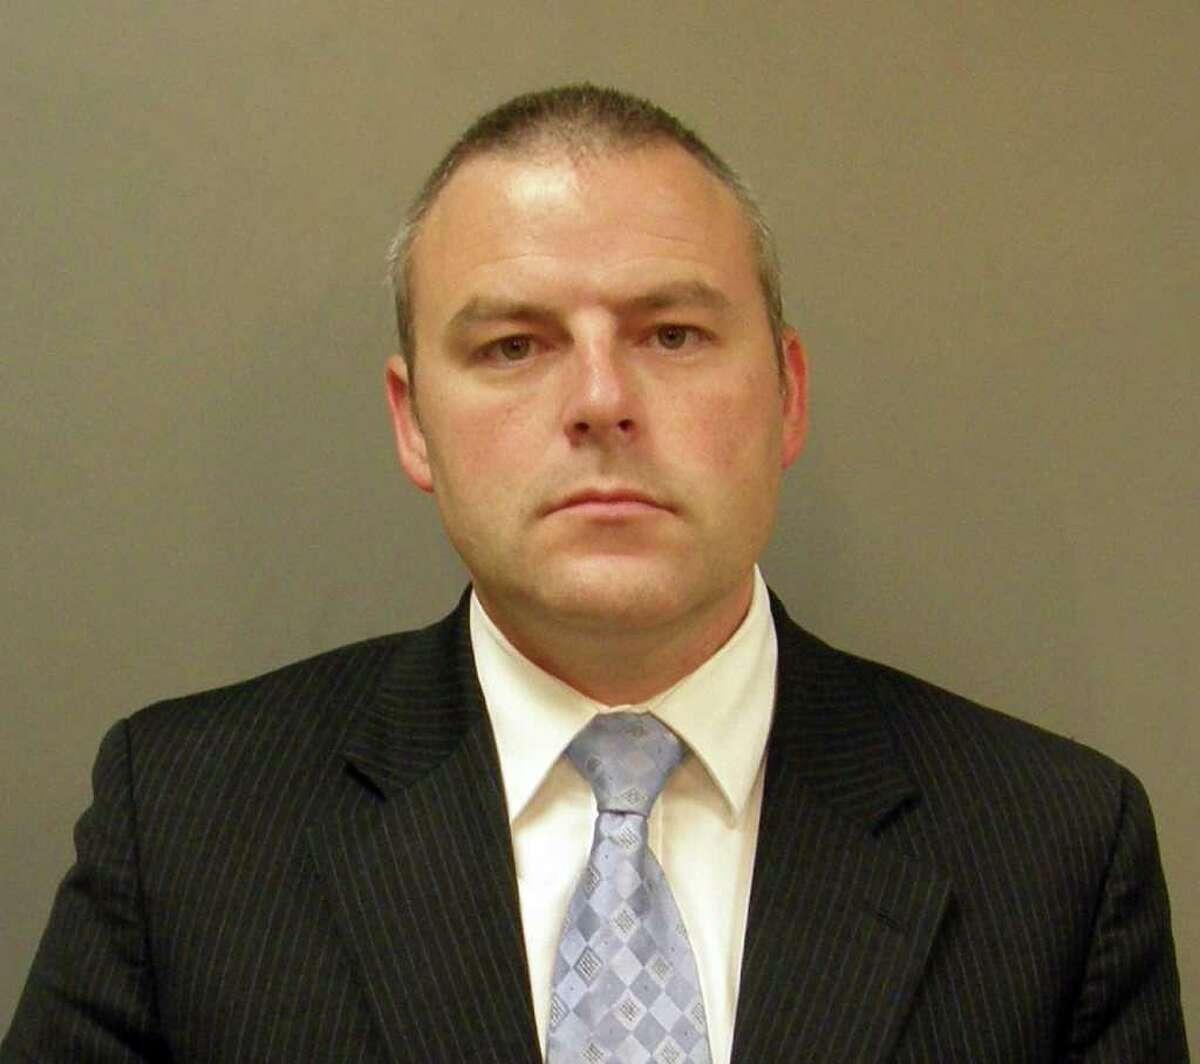 Kevin Wheatley (Photo / NY Attorney General)